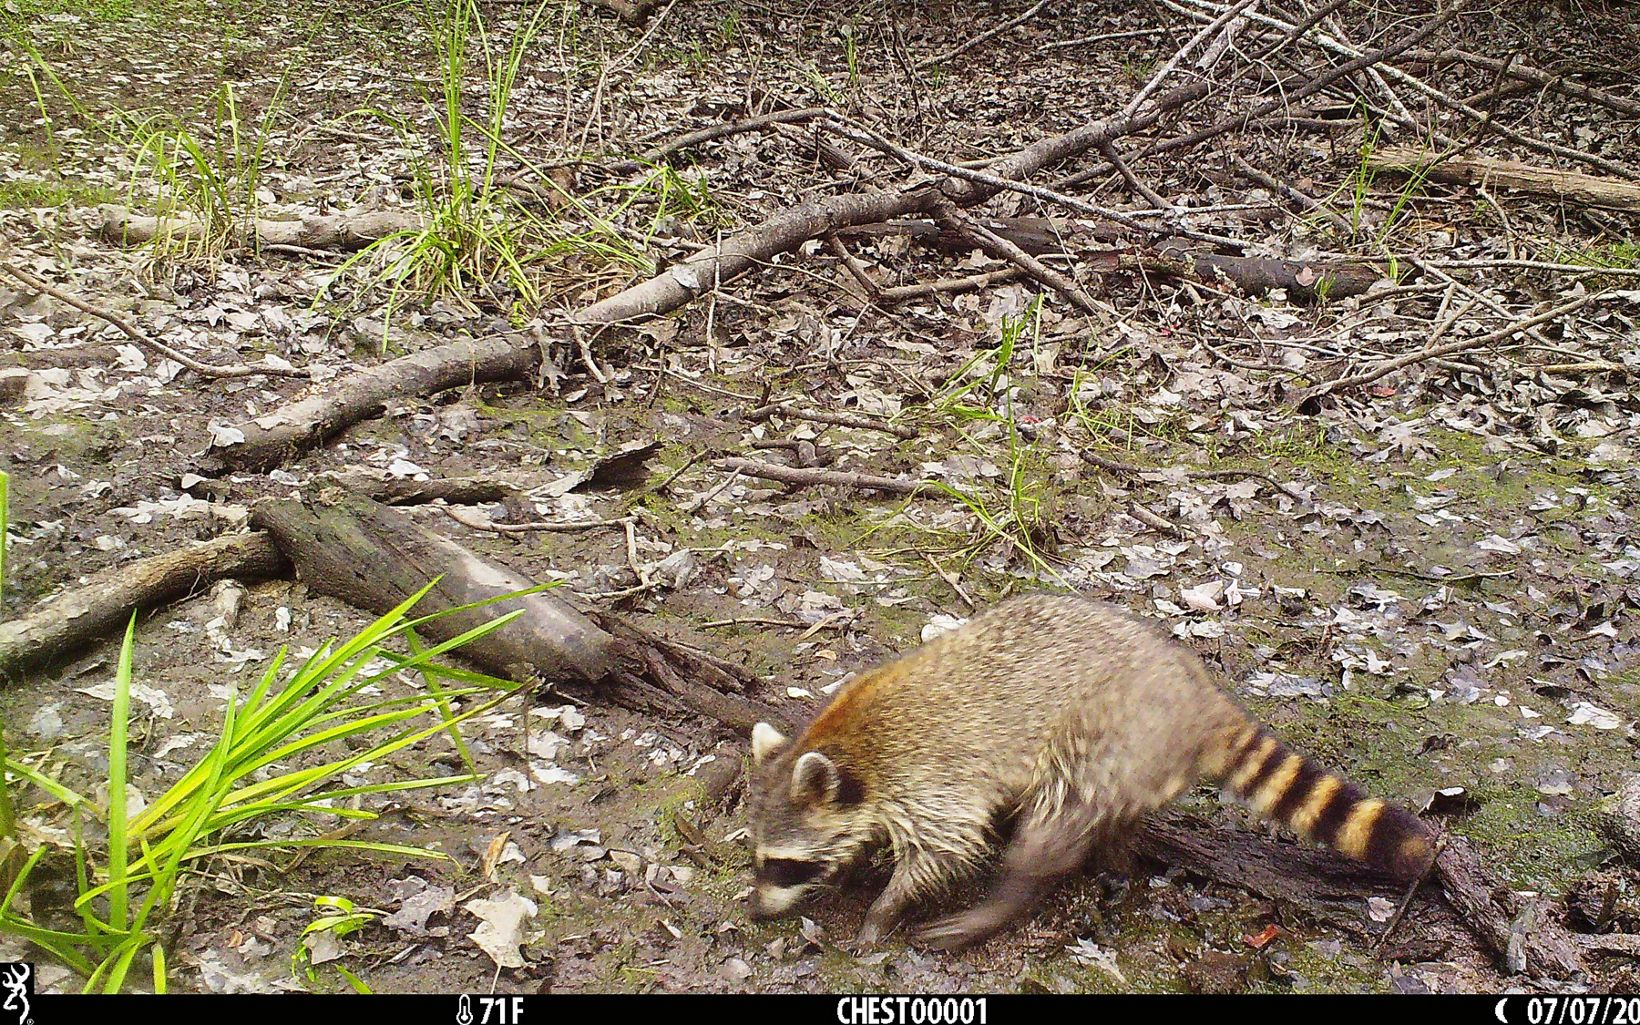 A raccoon walks along a forest floor.